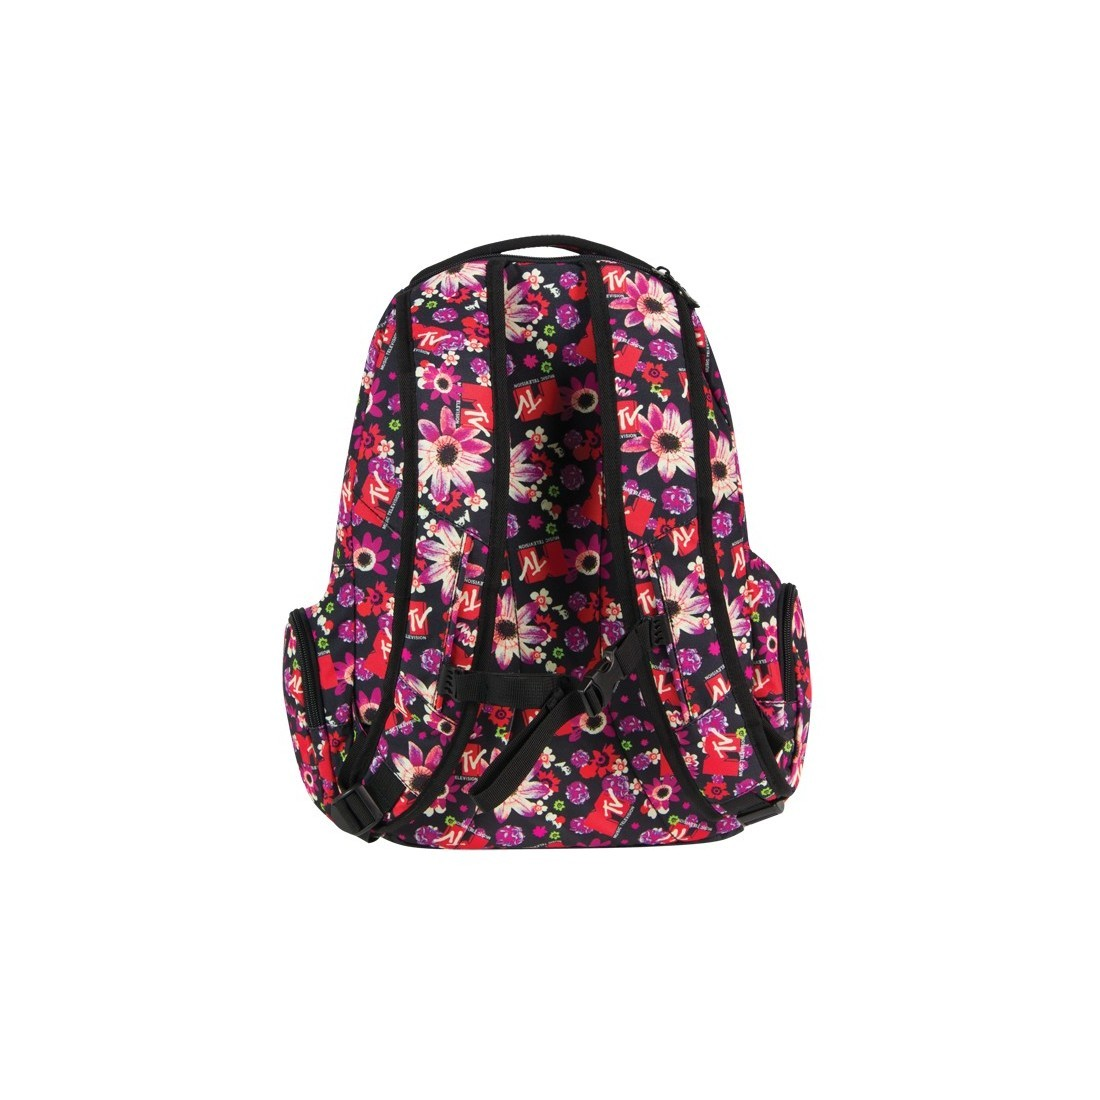 Plecak młodzieżowy duży MTV Coolpack Flowers - plecak-tornister.pl